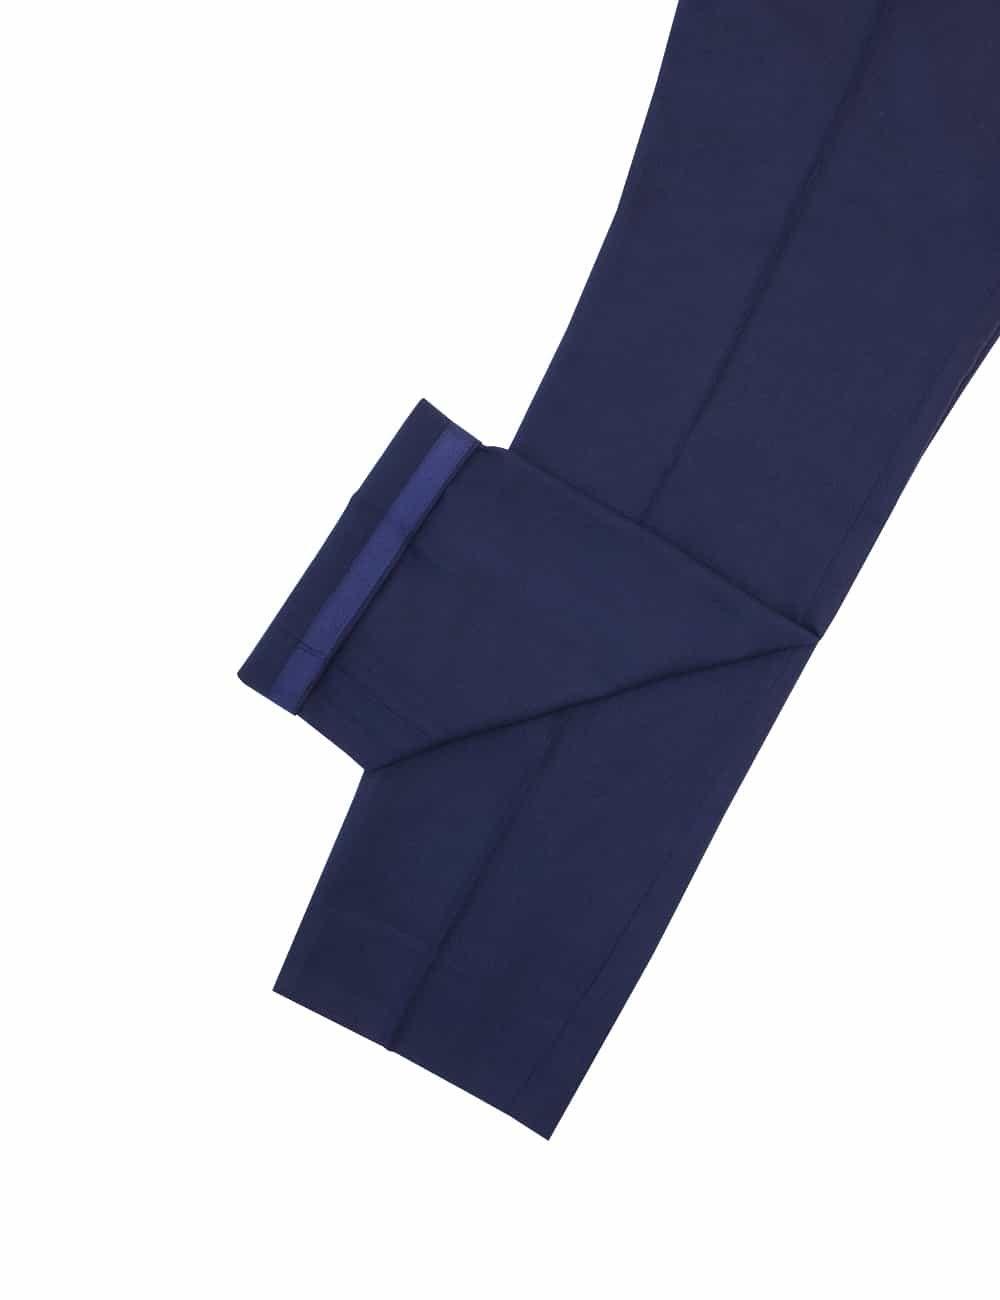 Tailored FitJetsetter Midnight Blue Smart Pocket Flat Front Dress Pants DPT1D7.2